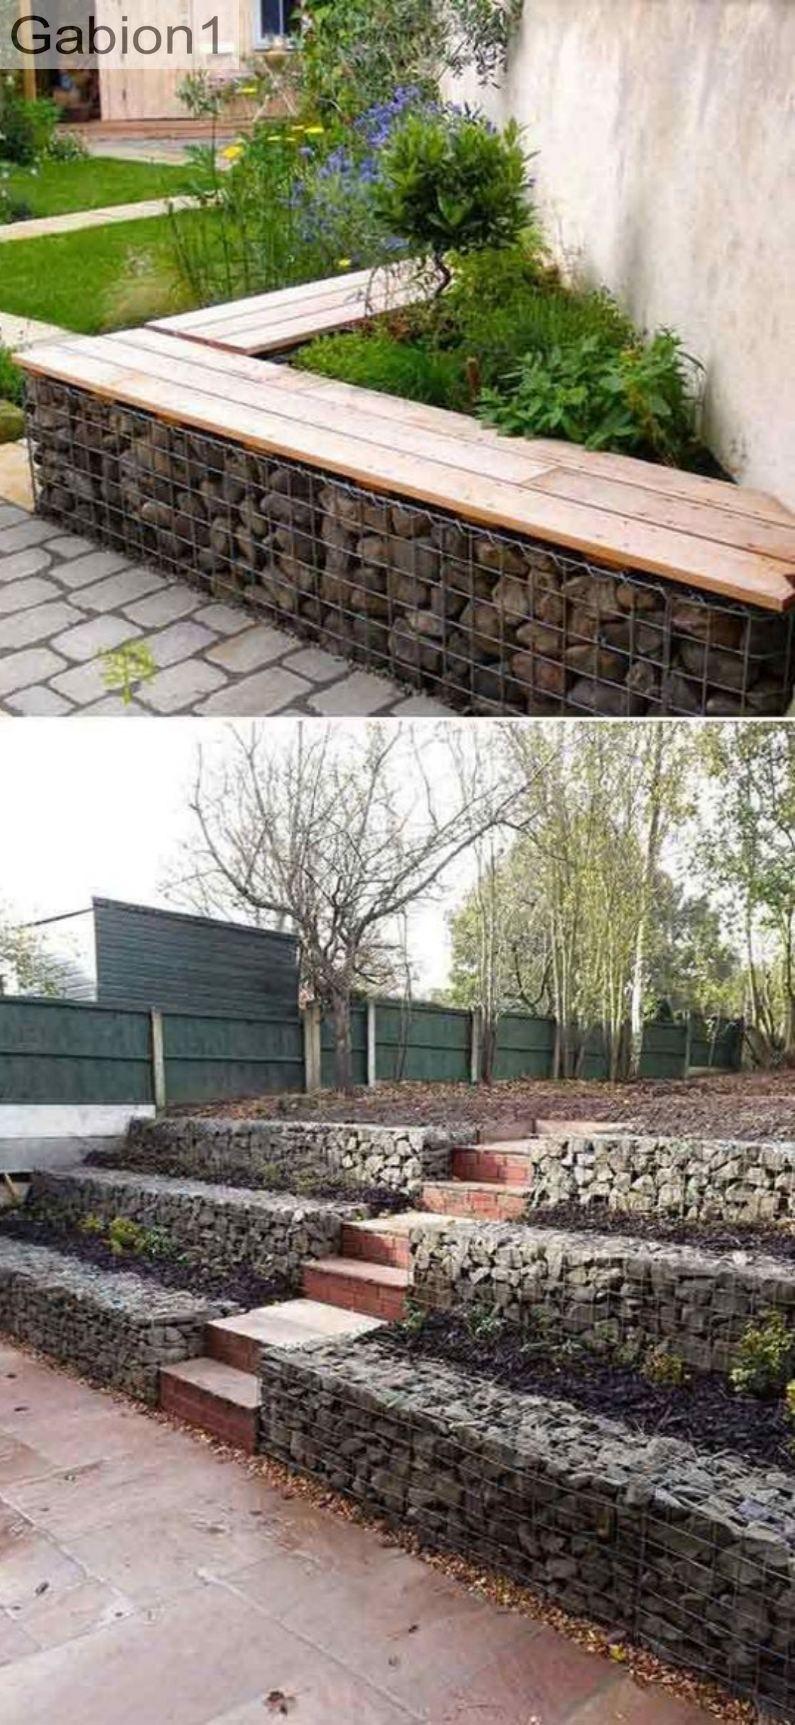 Examples Of Small Gabion Retaining Walls Www Gabion1 Com 640 x 480